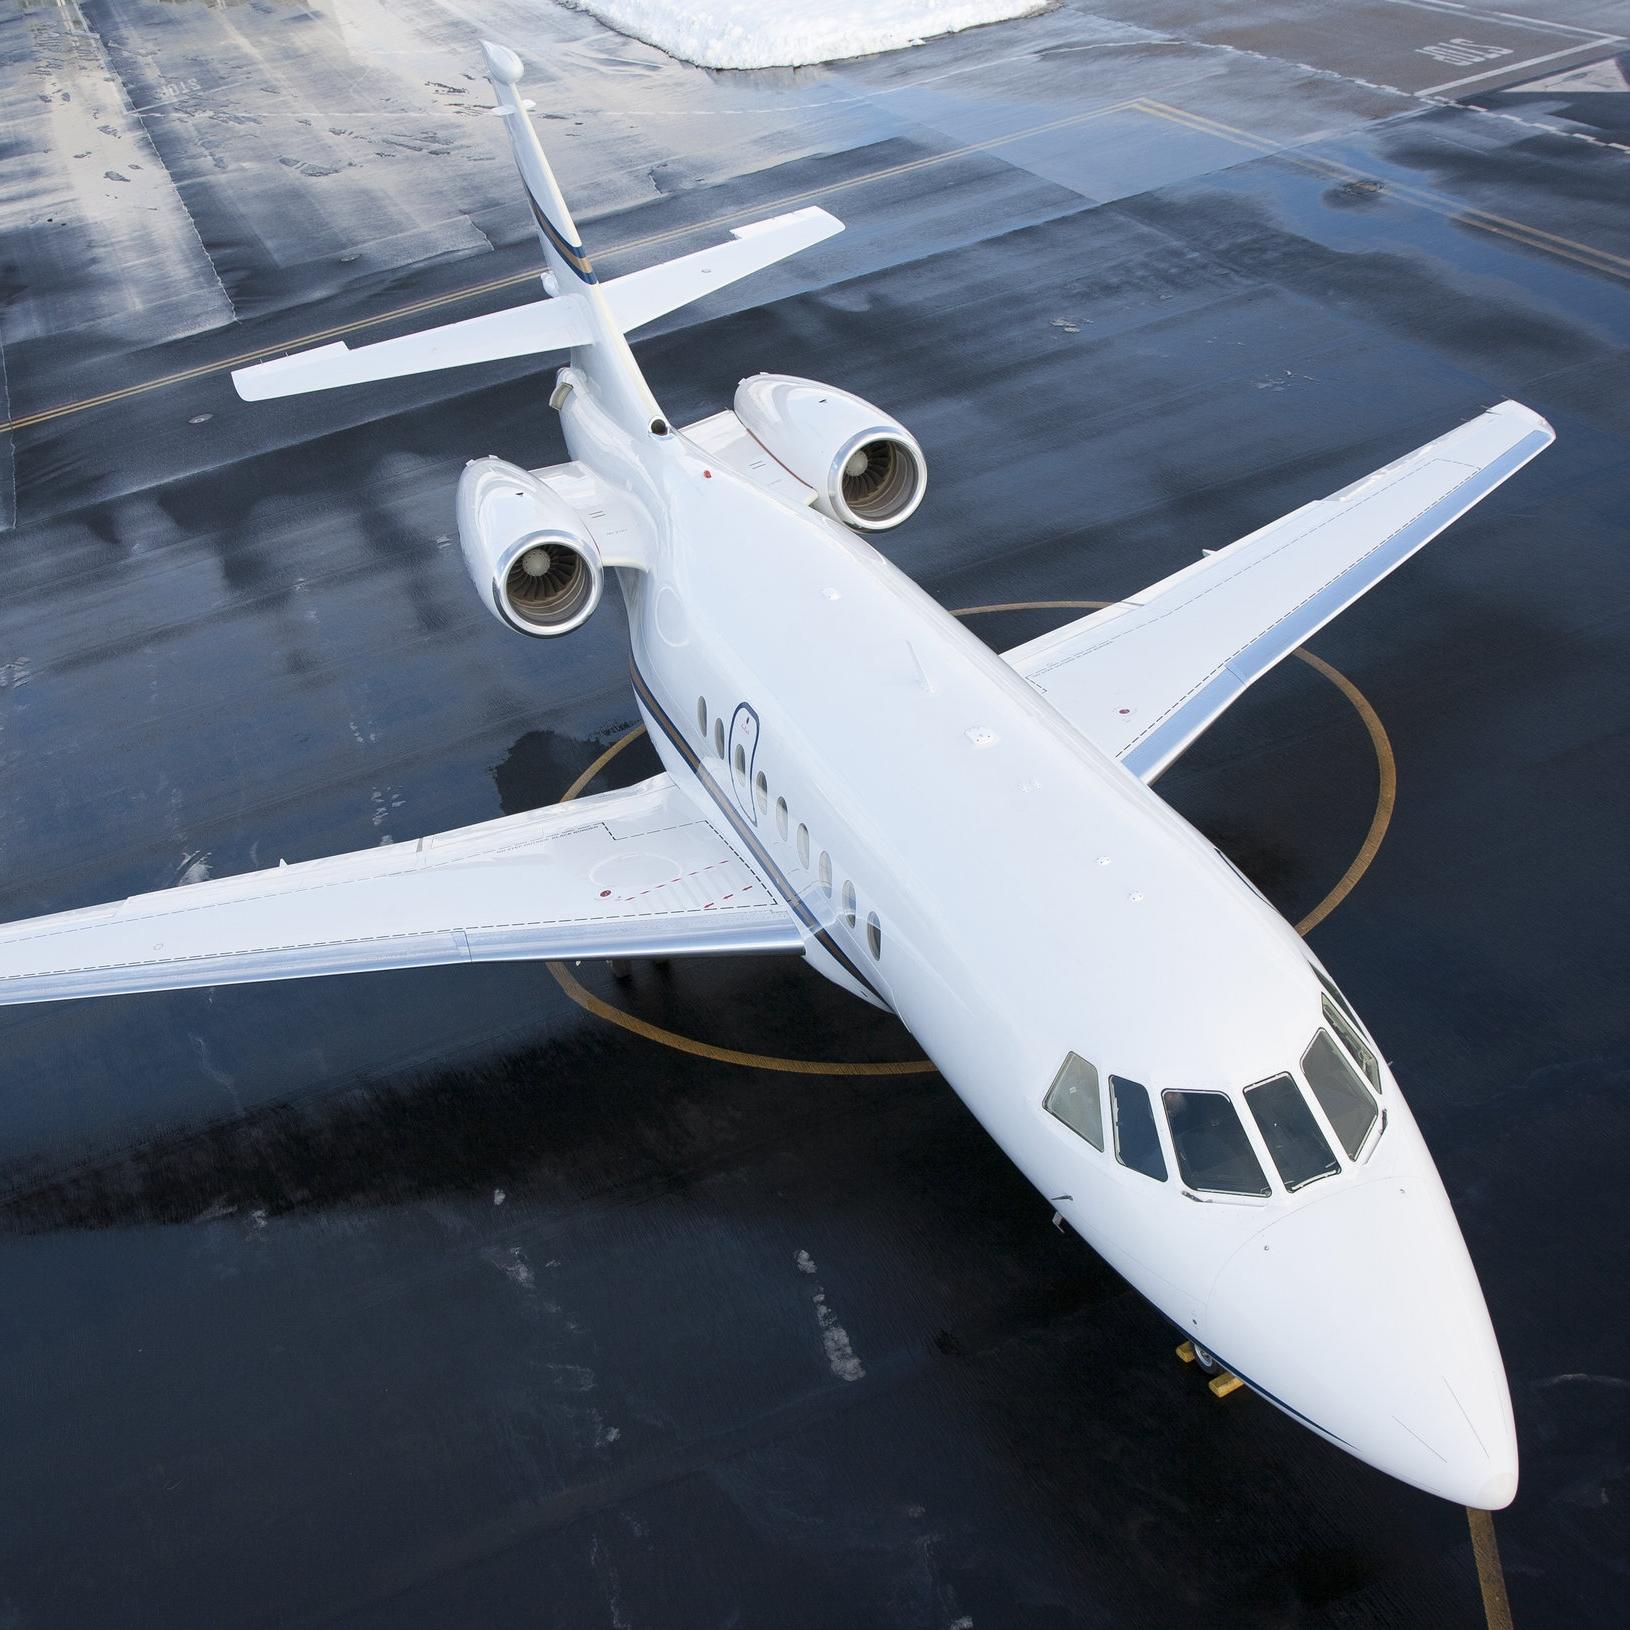 Aircraft Sales at Aeromanagement Group